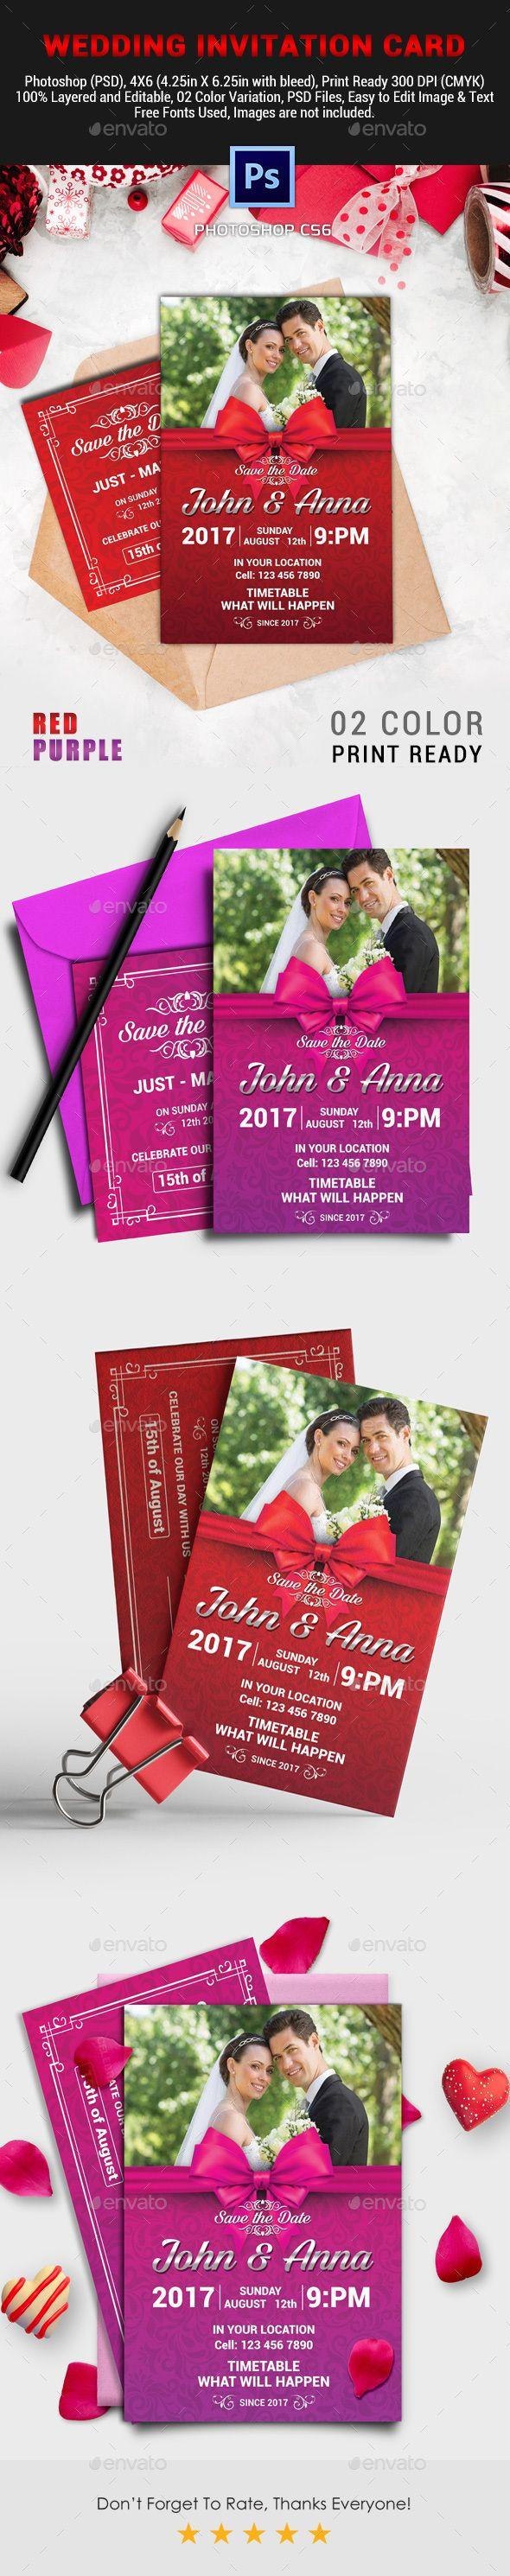 Wedding invitation card vol 03 stopboris Gallery